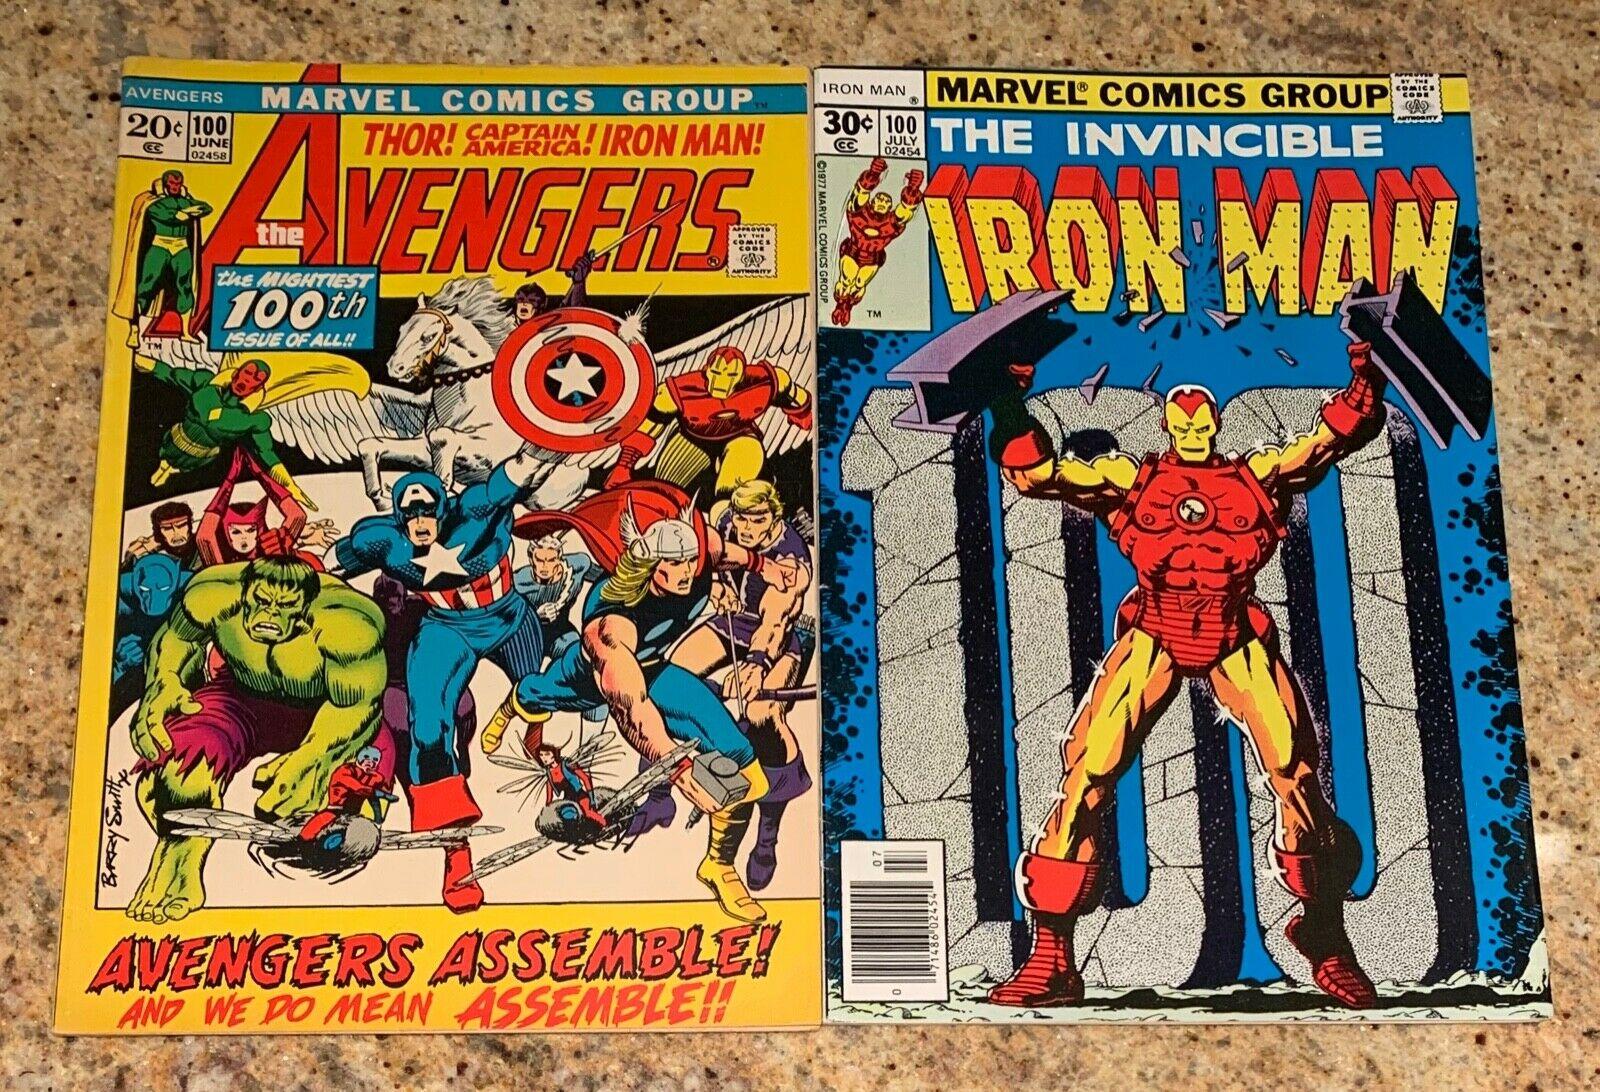 THE AVENGERS #100  IRON MAN #100 VF MARVEL BRONZE AGE CLASSIC COMICS 1972  1977